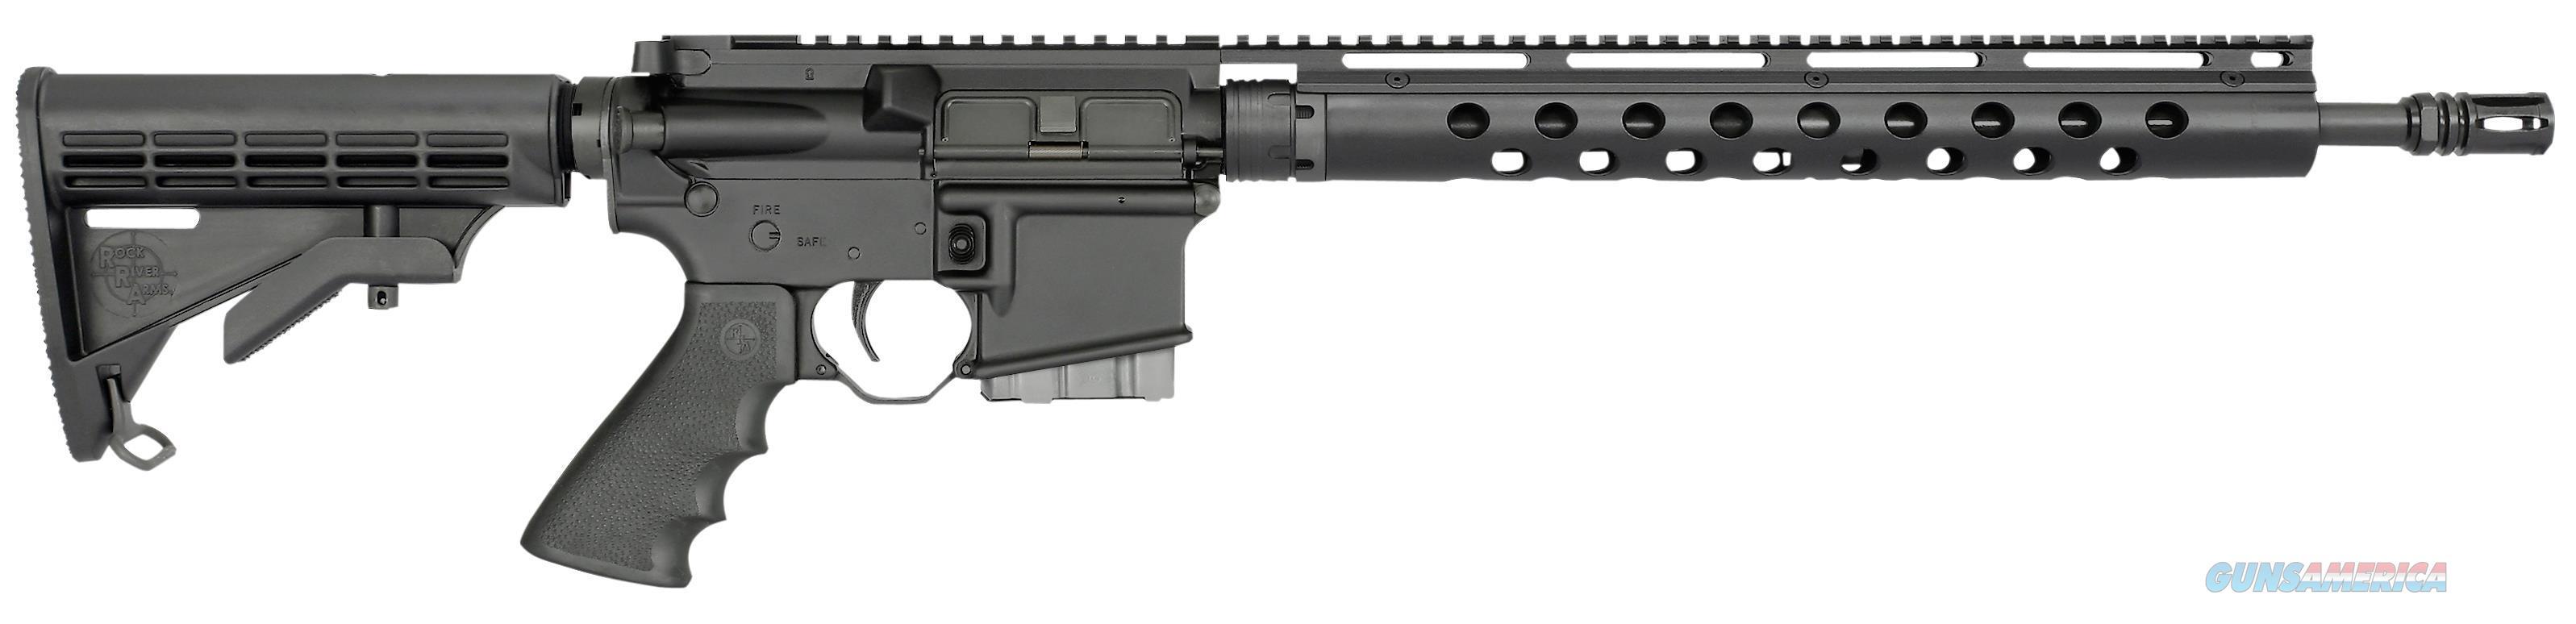 "Rock River Arms Mt1800 Lar-15 Lightweight Mountain Rifle Semi-Automatic 223 Remington/5.56 Nato 16"" 30+1 6-Position Black Stk Black MT1800  Guns > Rifles > Rock River Arms Rifles"